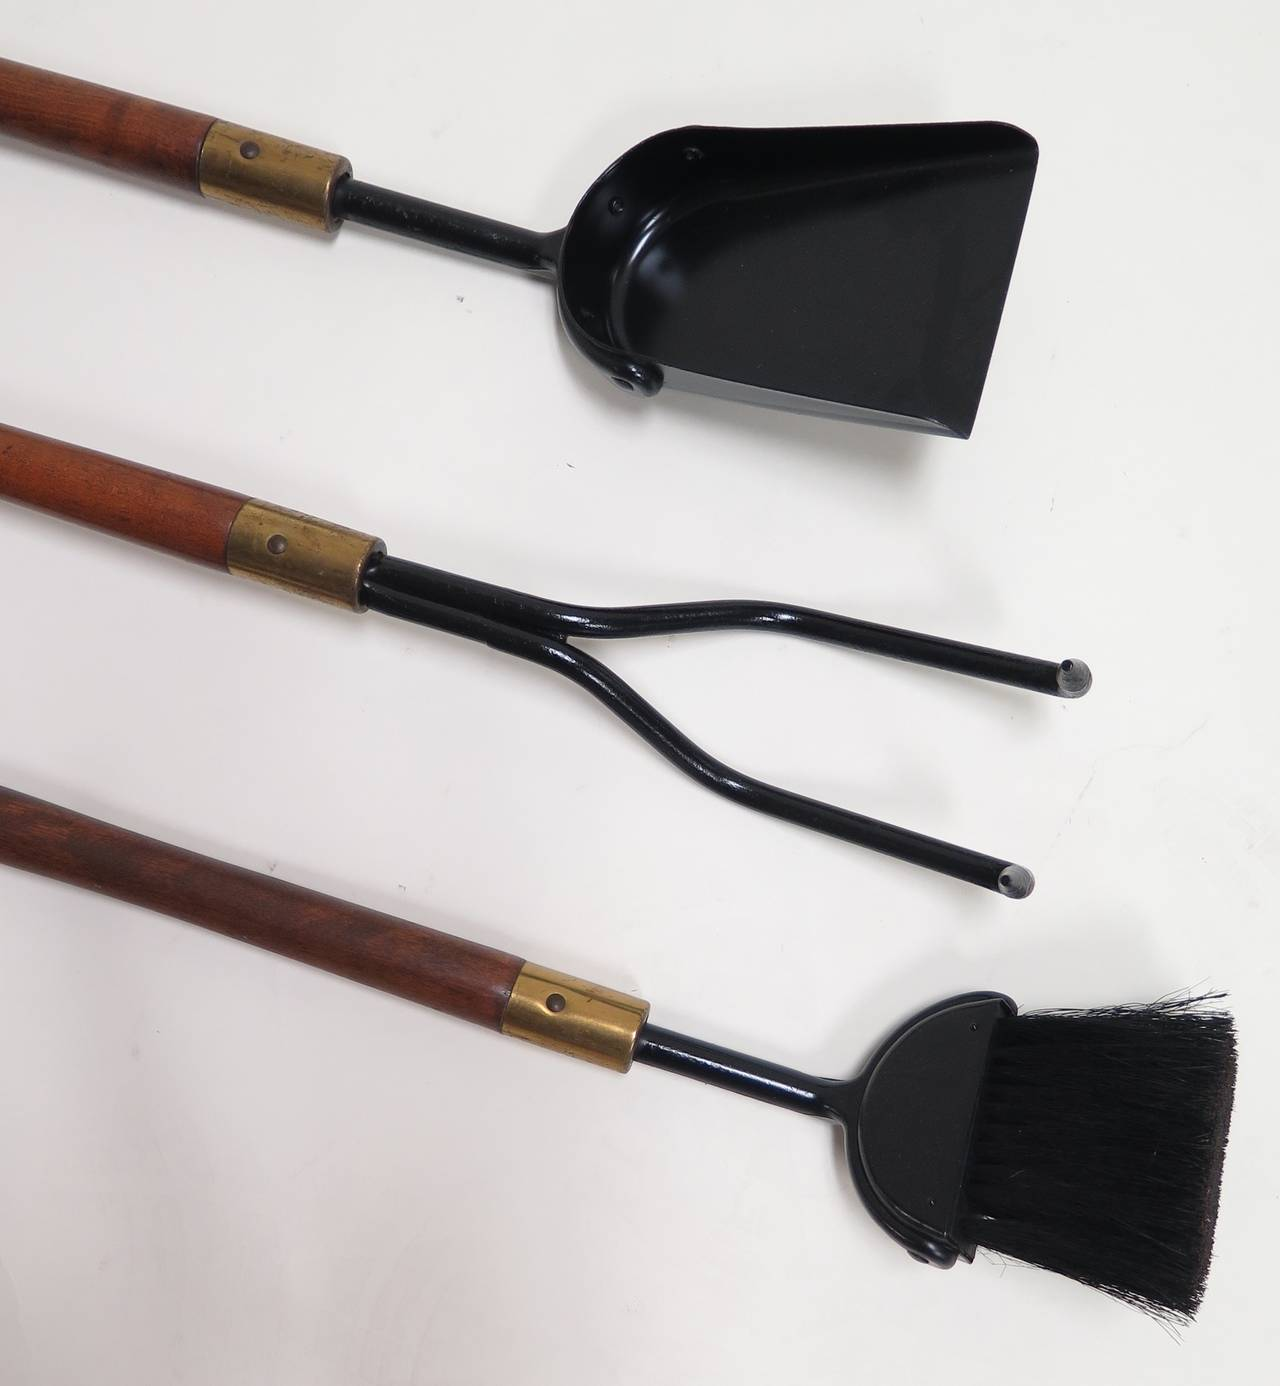 1950 seymour co heavy duty fireplace tool set at 1stdibs for Heavy duty garden tools